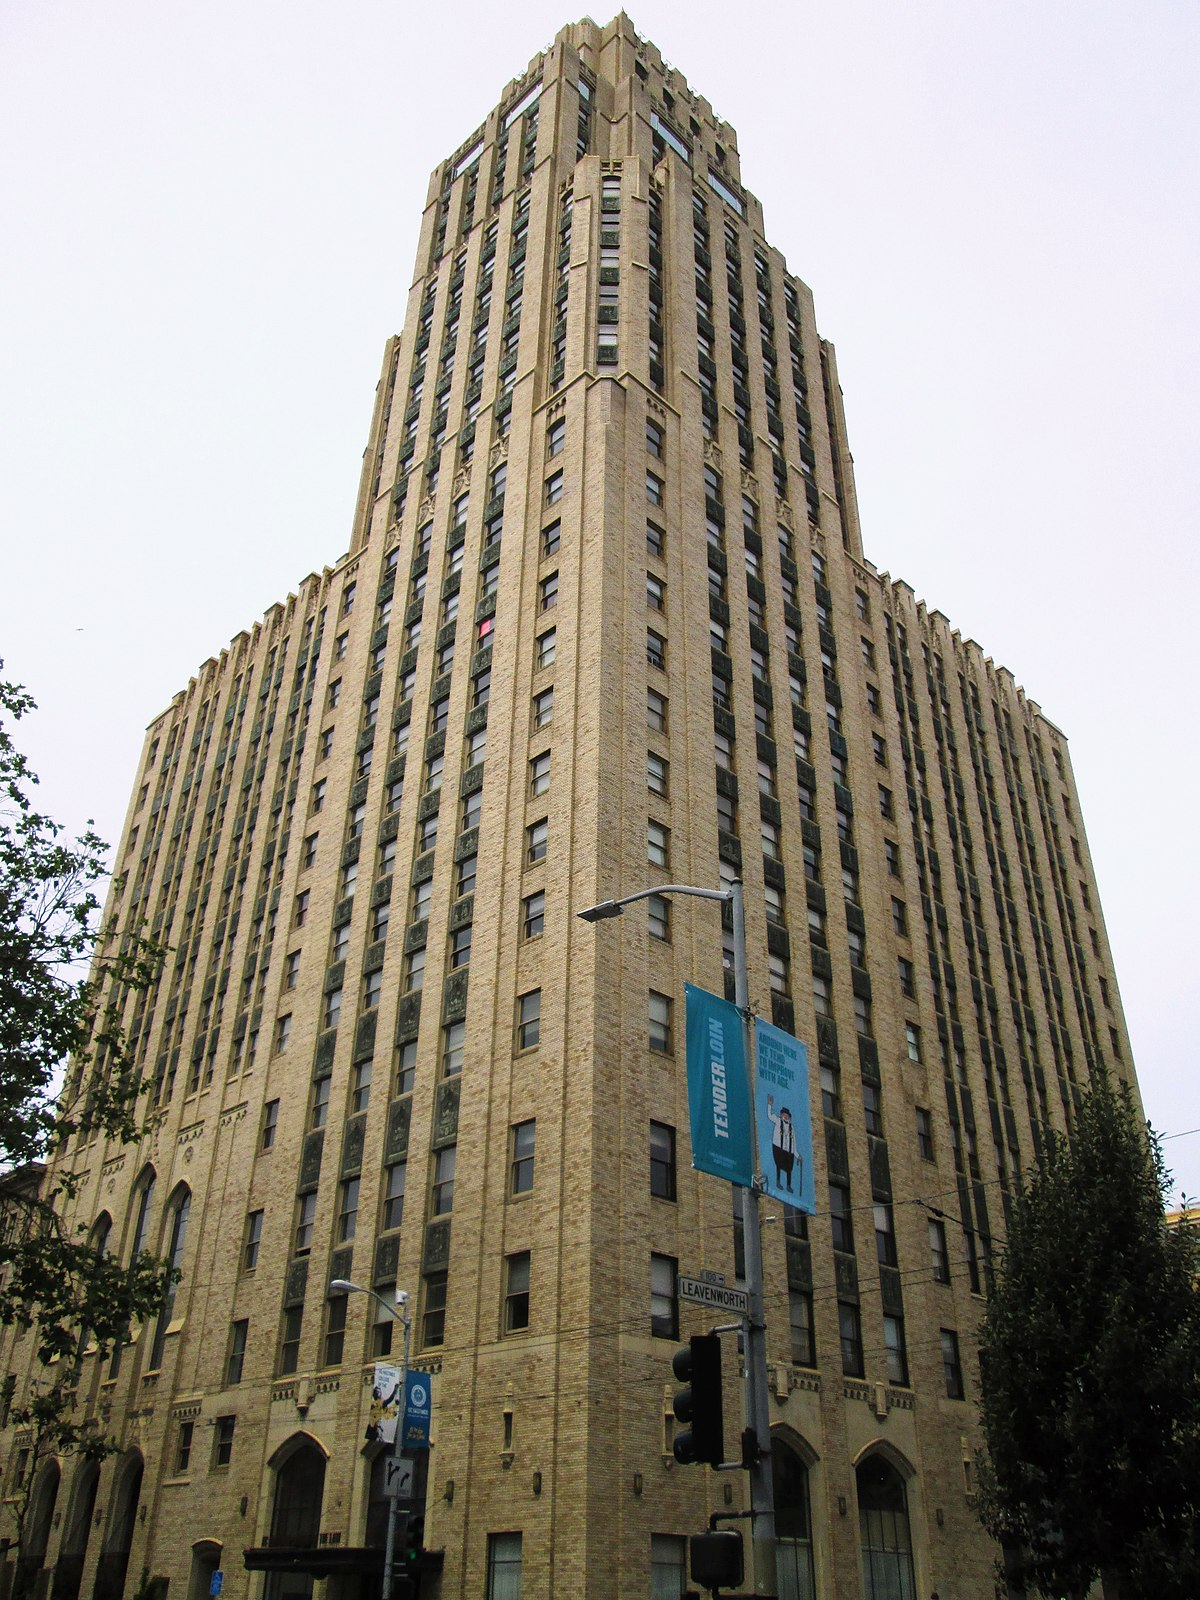 McAllister Tower Apartments  Wikipedia